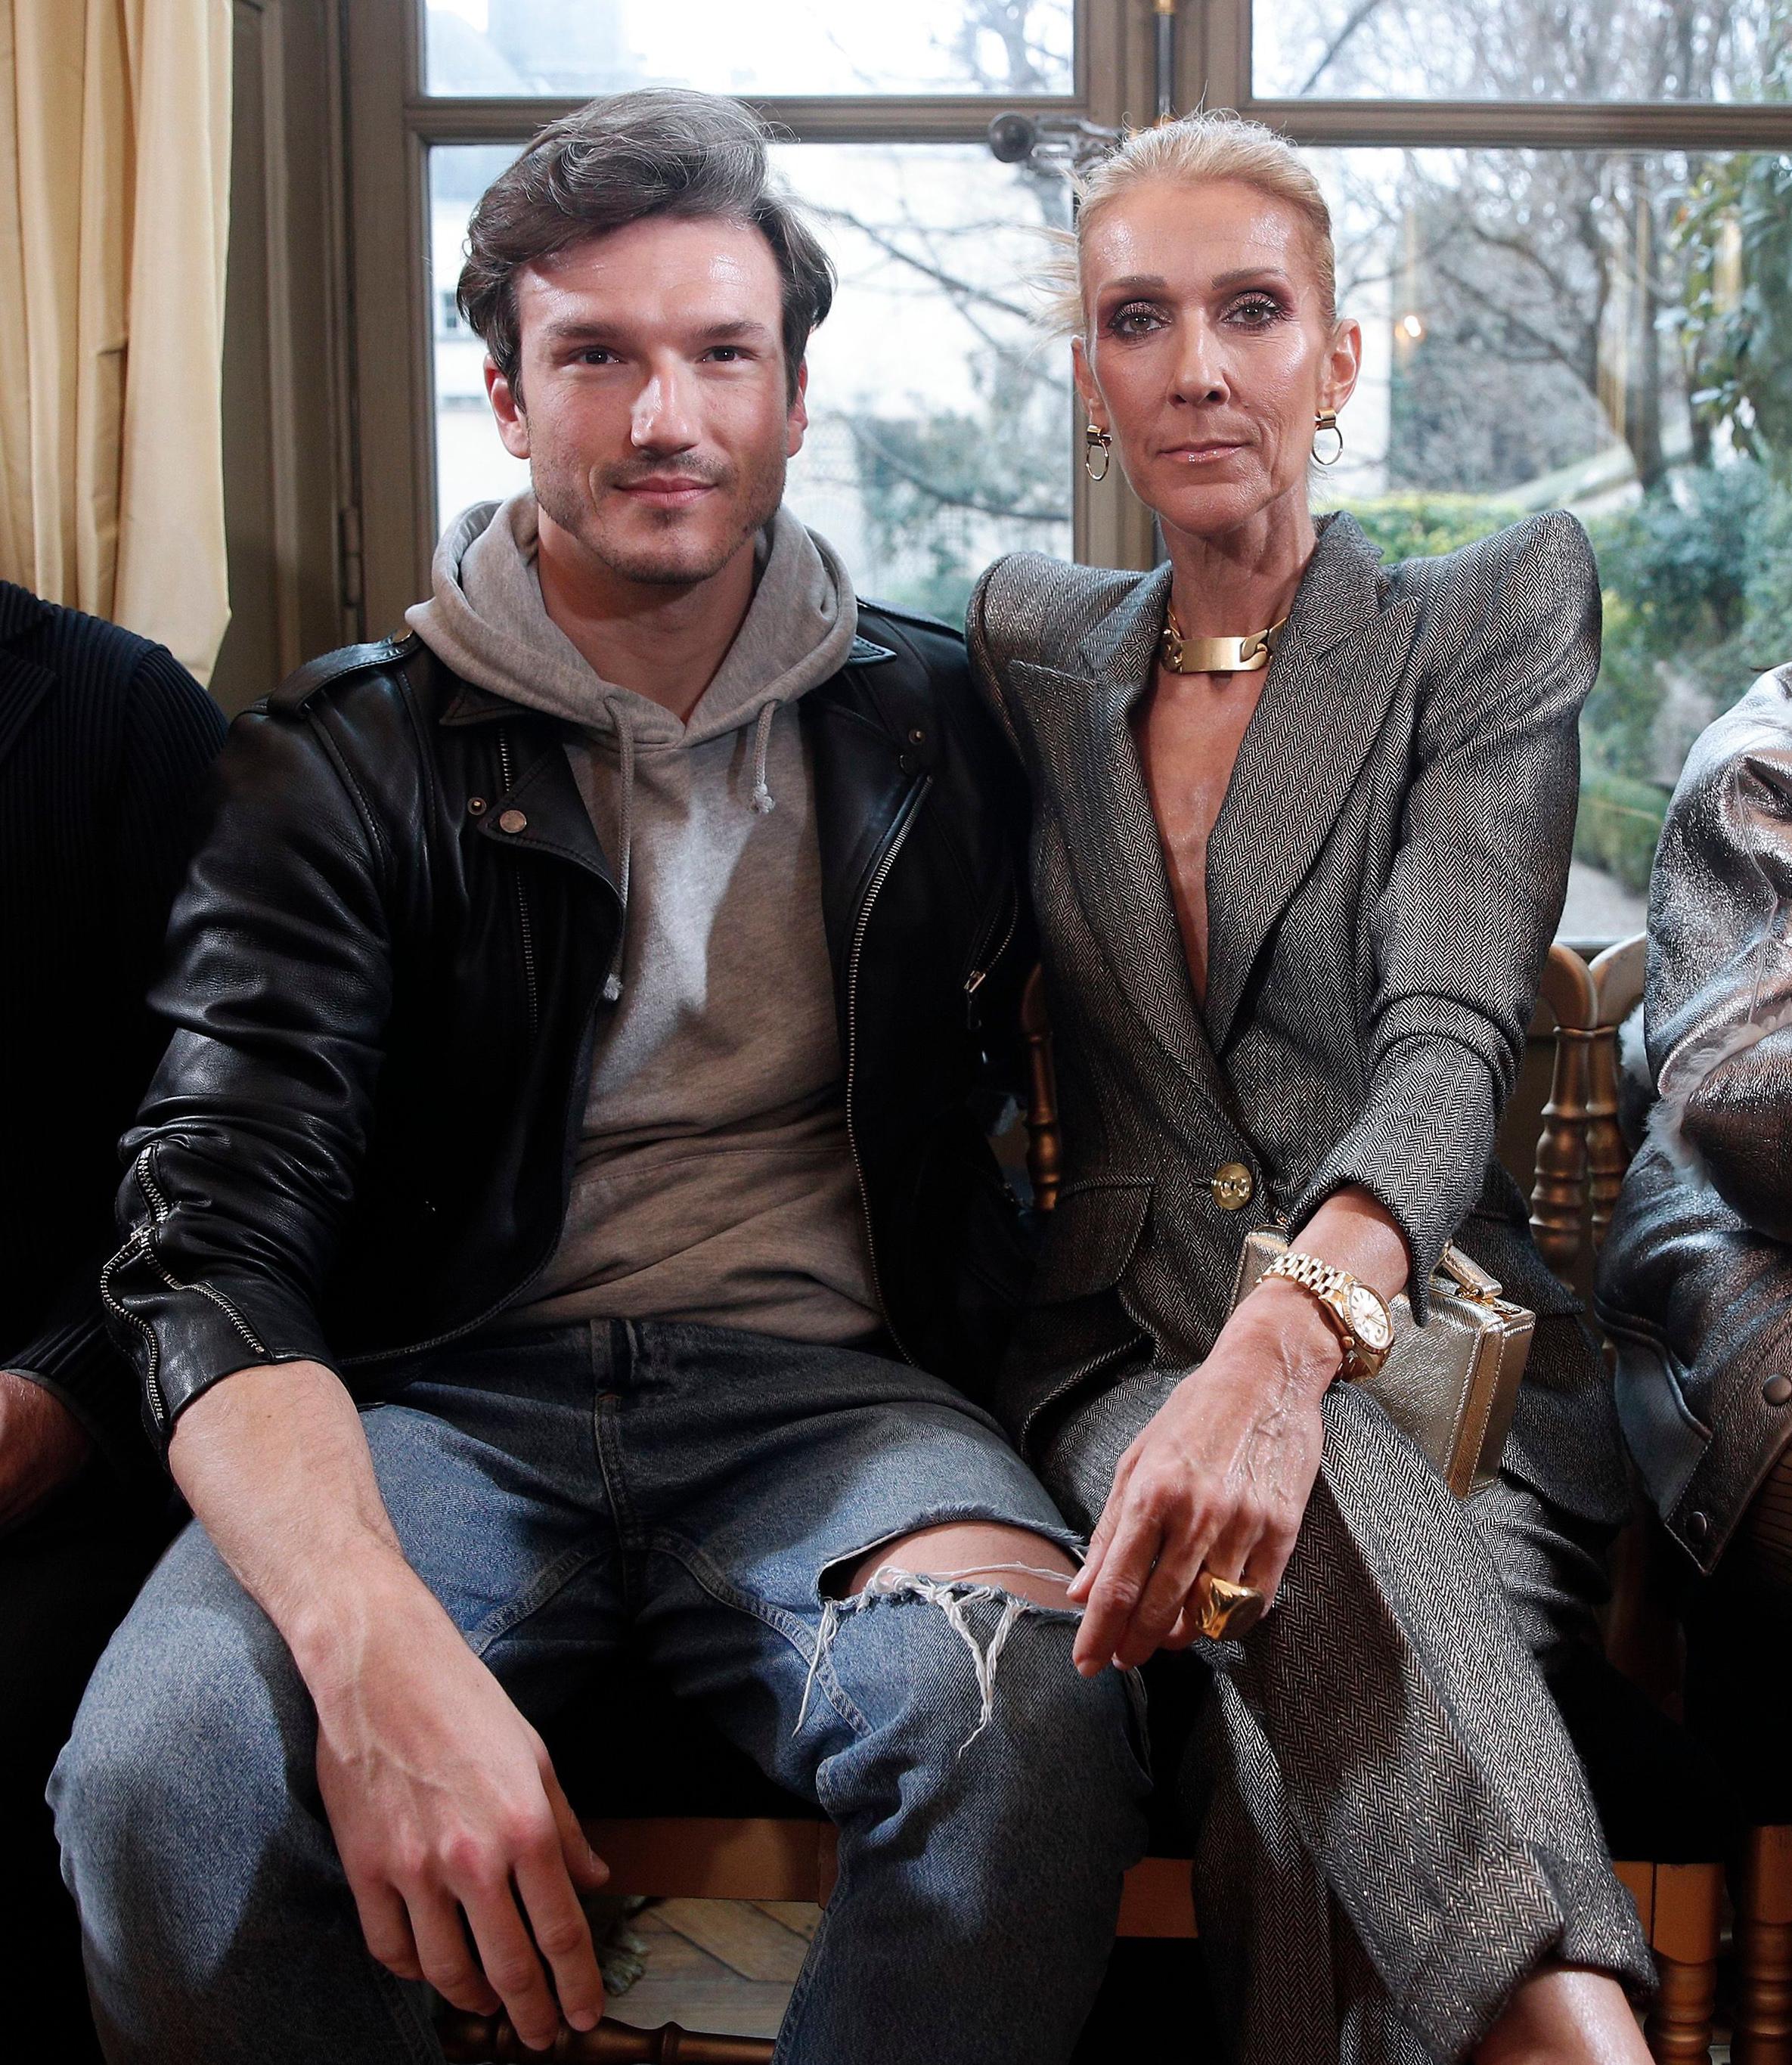 Celine Dion addresses Pepe Munoz romance rumors: 'He's my best friend'